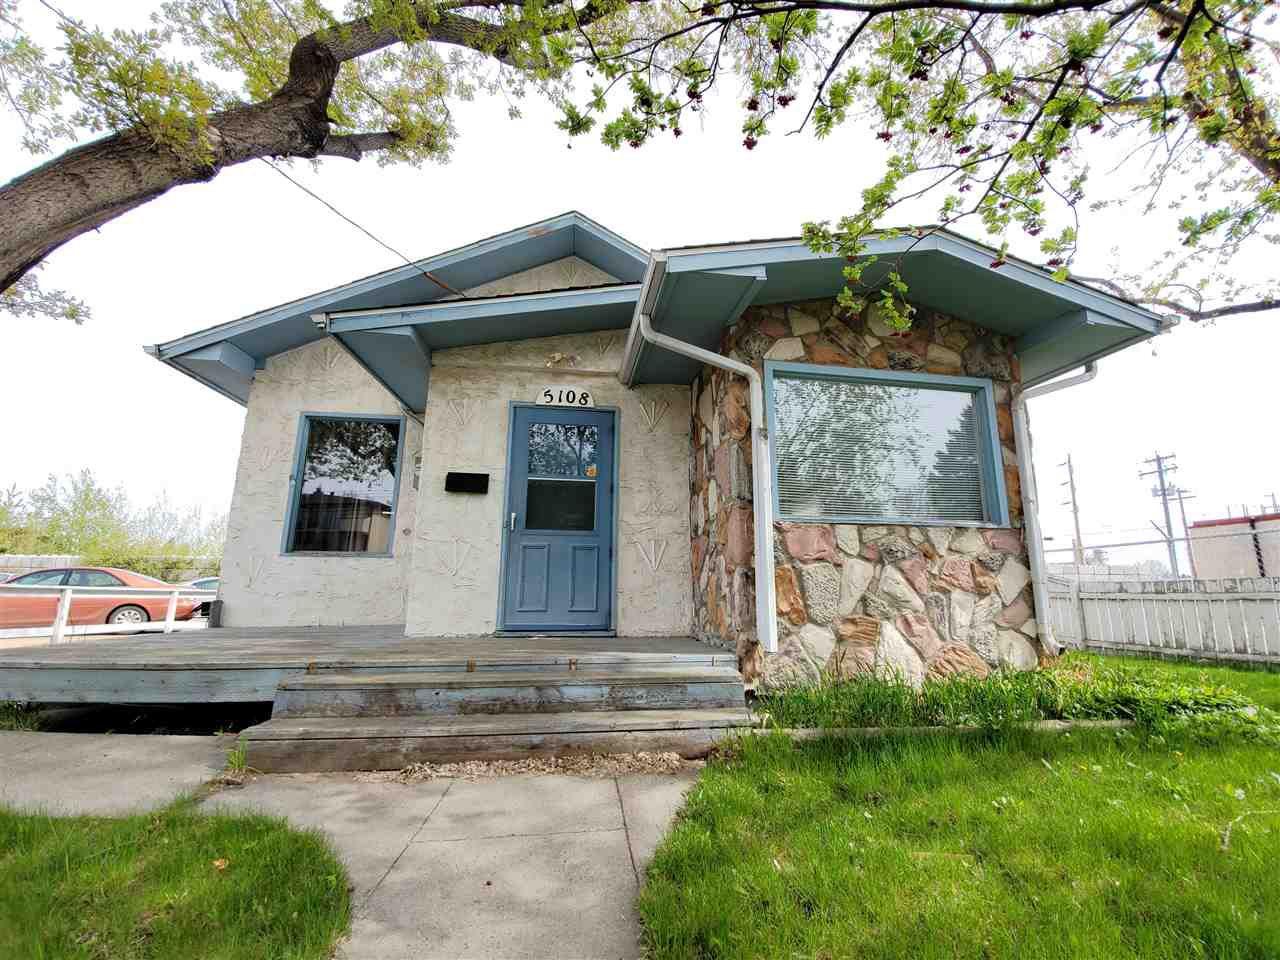 Main Photo: 5108 53 Avenue: Wetaskiwin House for sale : MLS®# E4157592